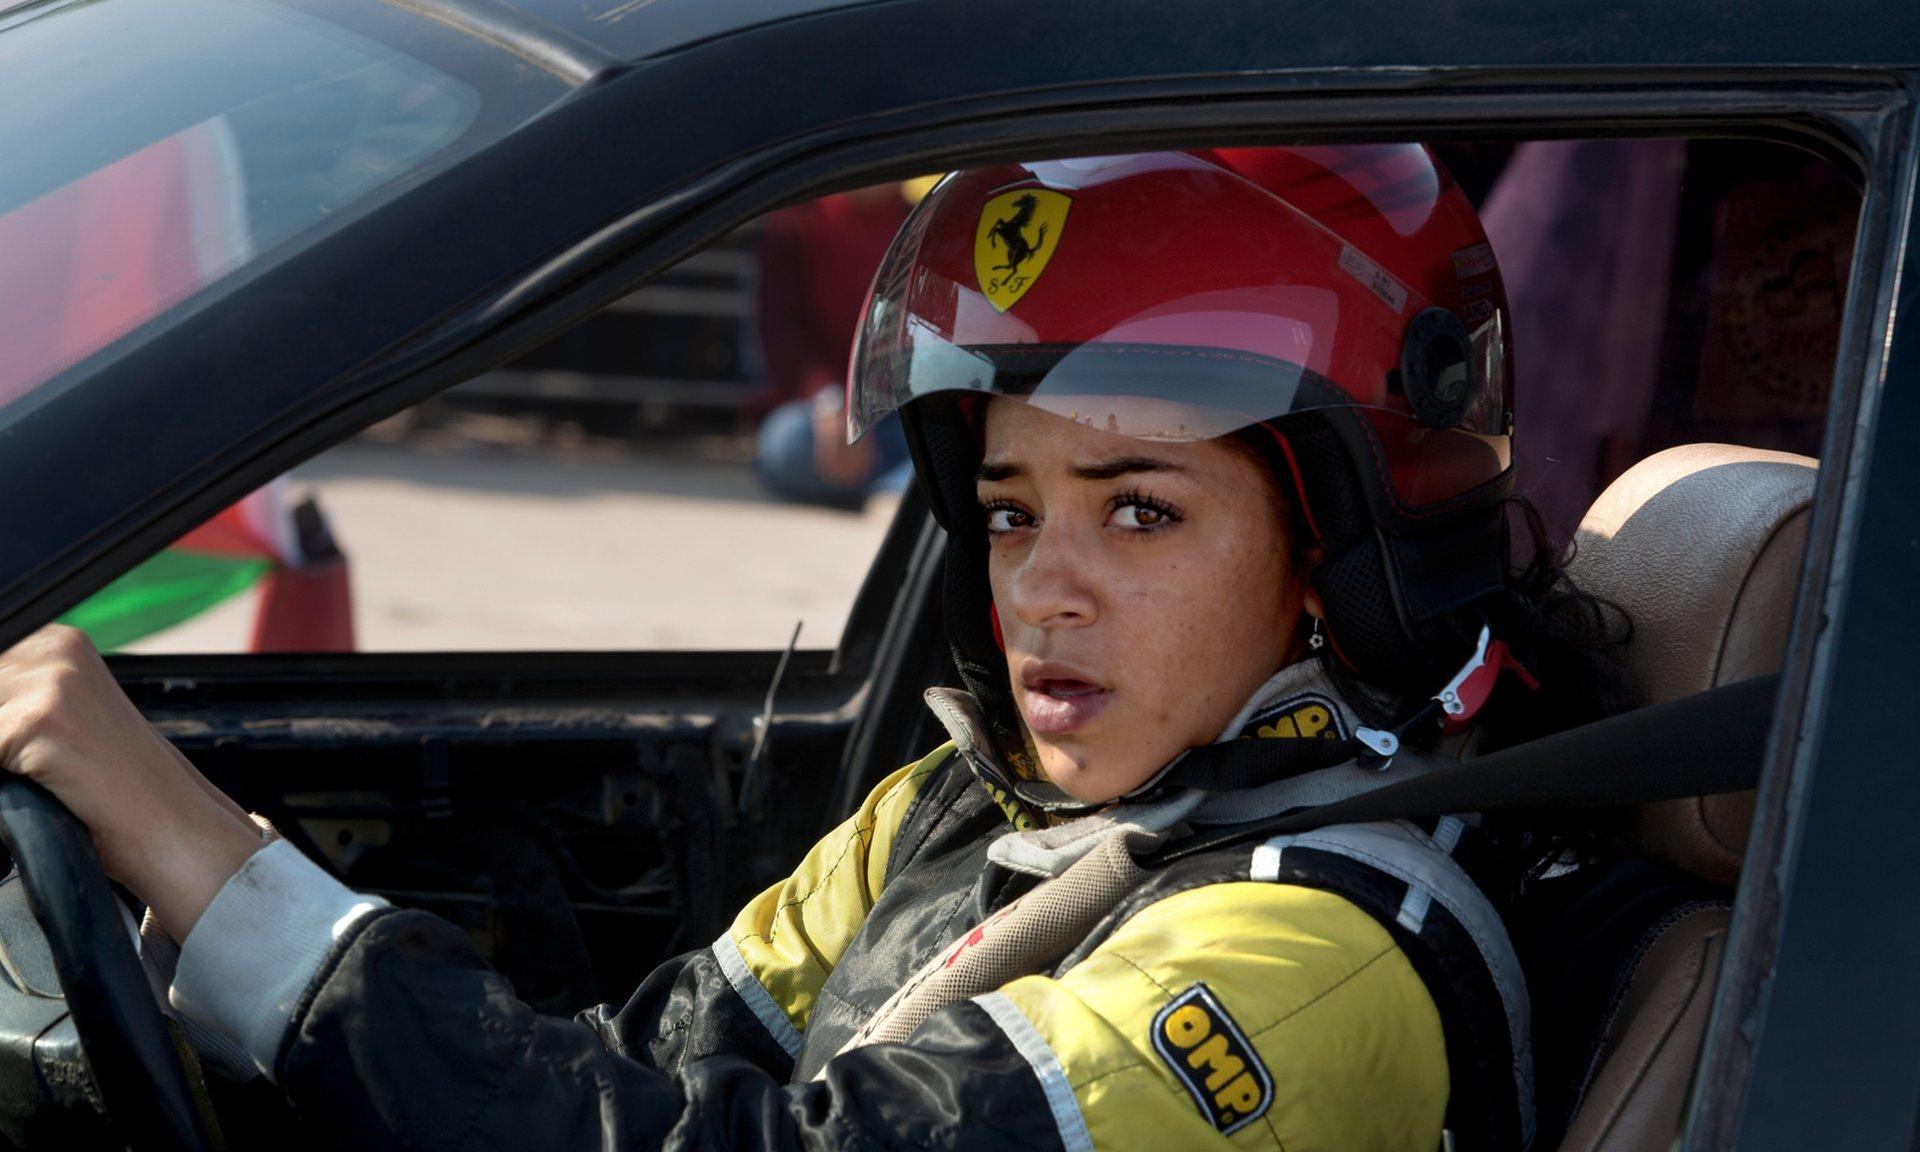 spoutnik palestine filmer c'est exister 2016 speed sisters